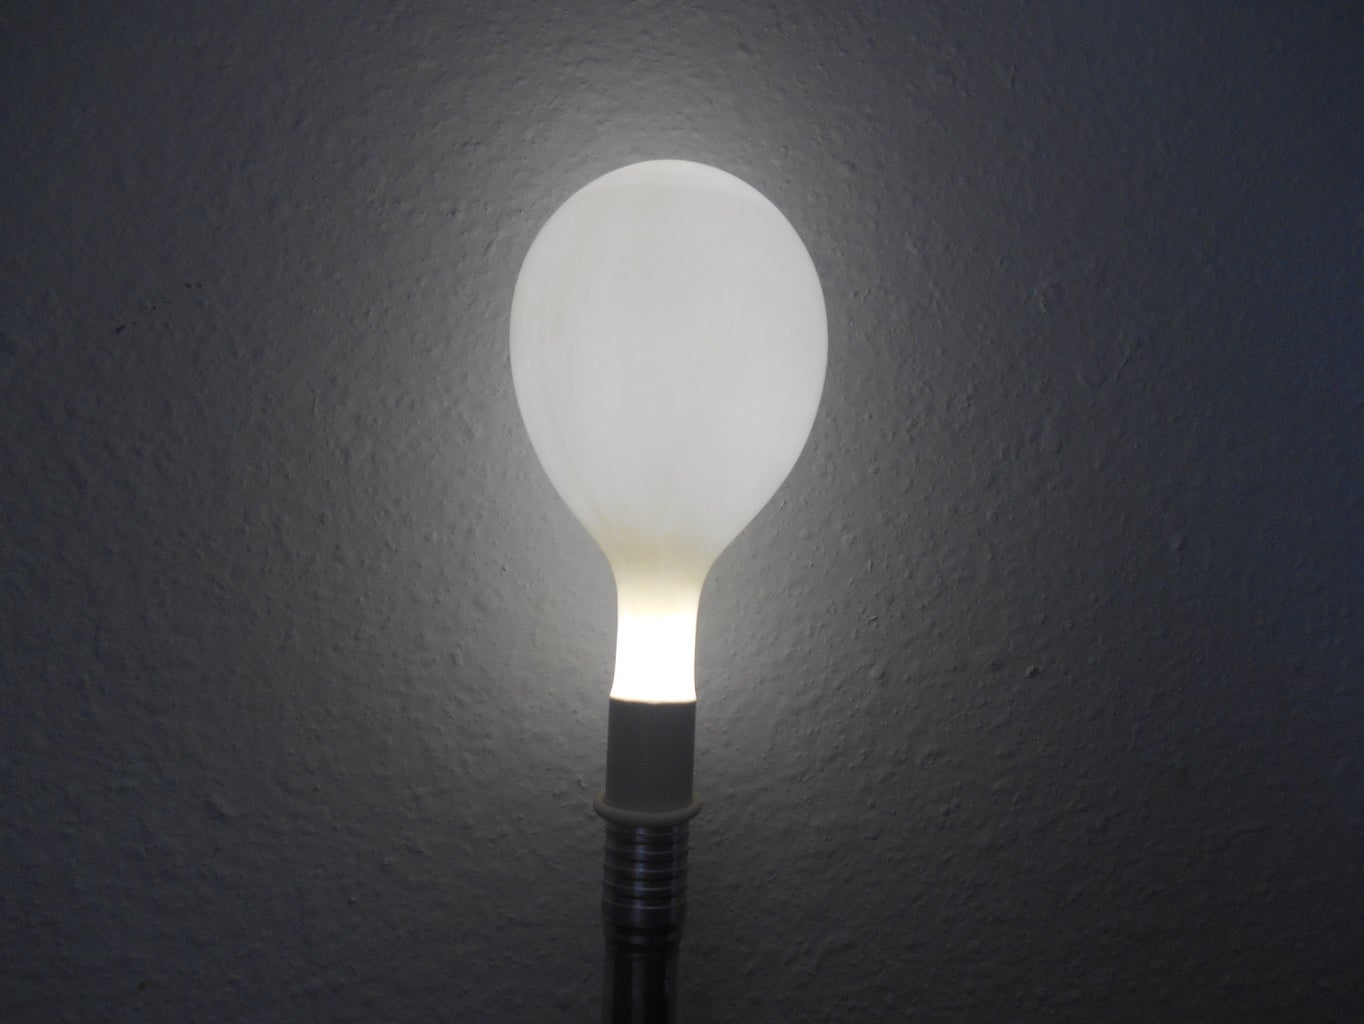 Turn a Flashlight Into a Lantern Using a Balloon